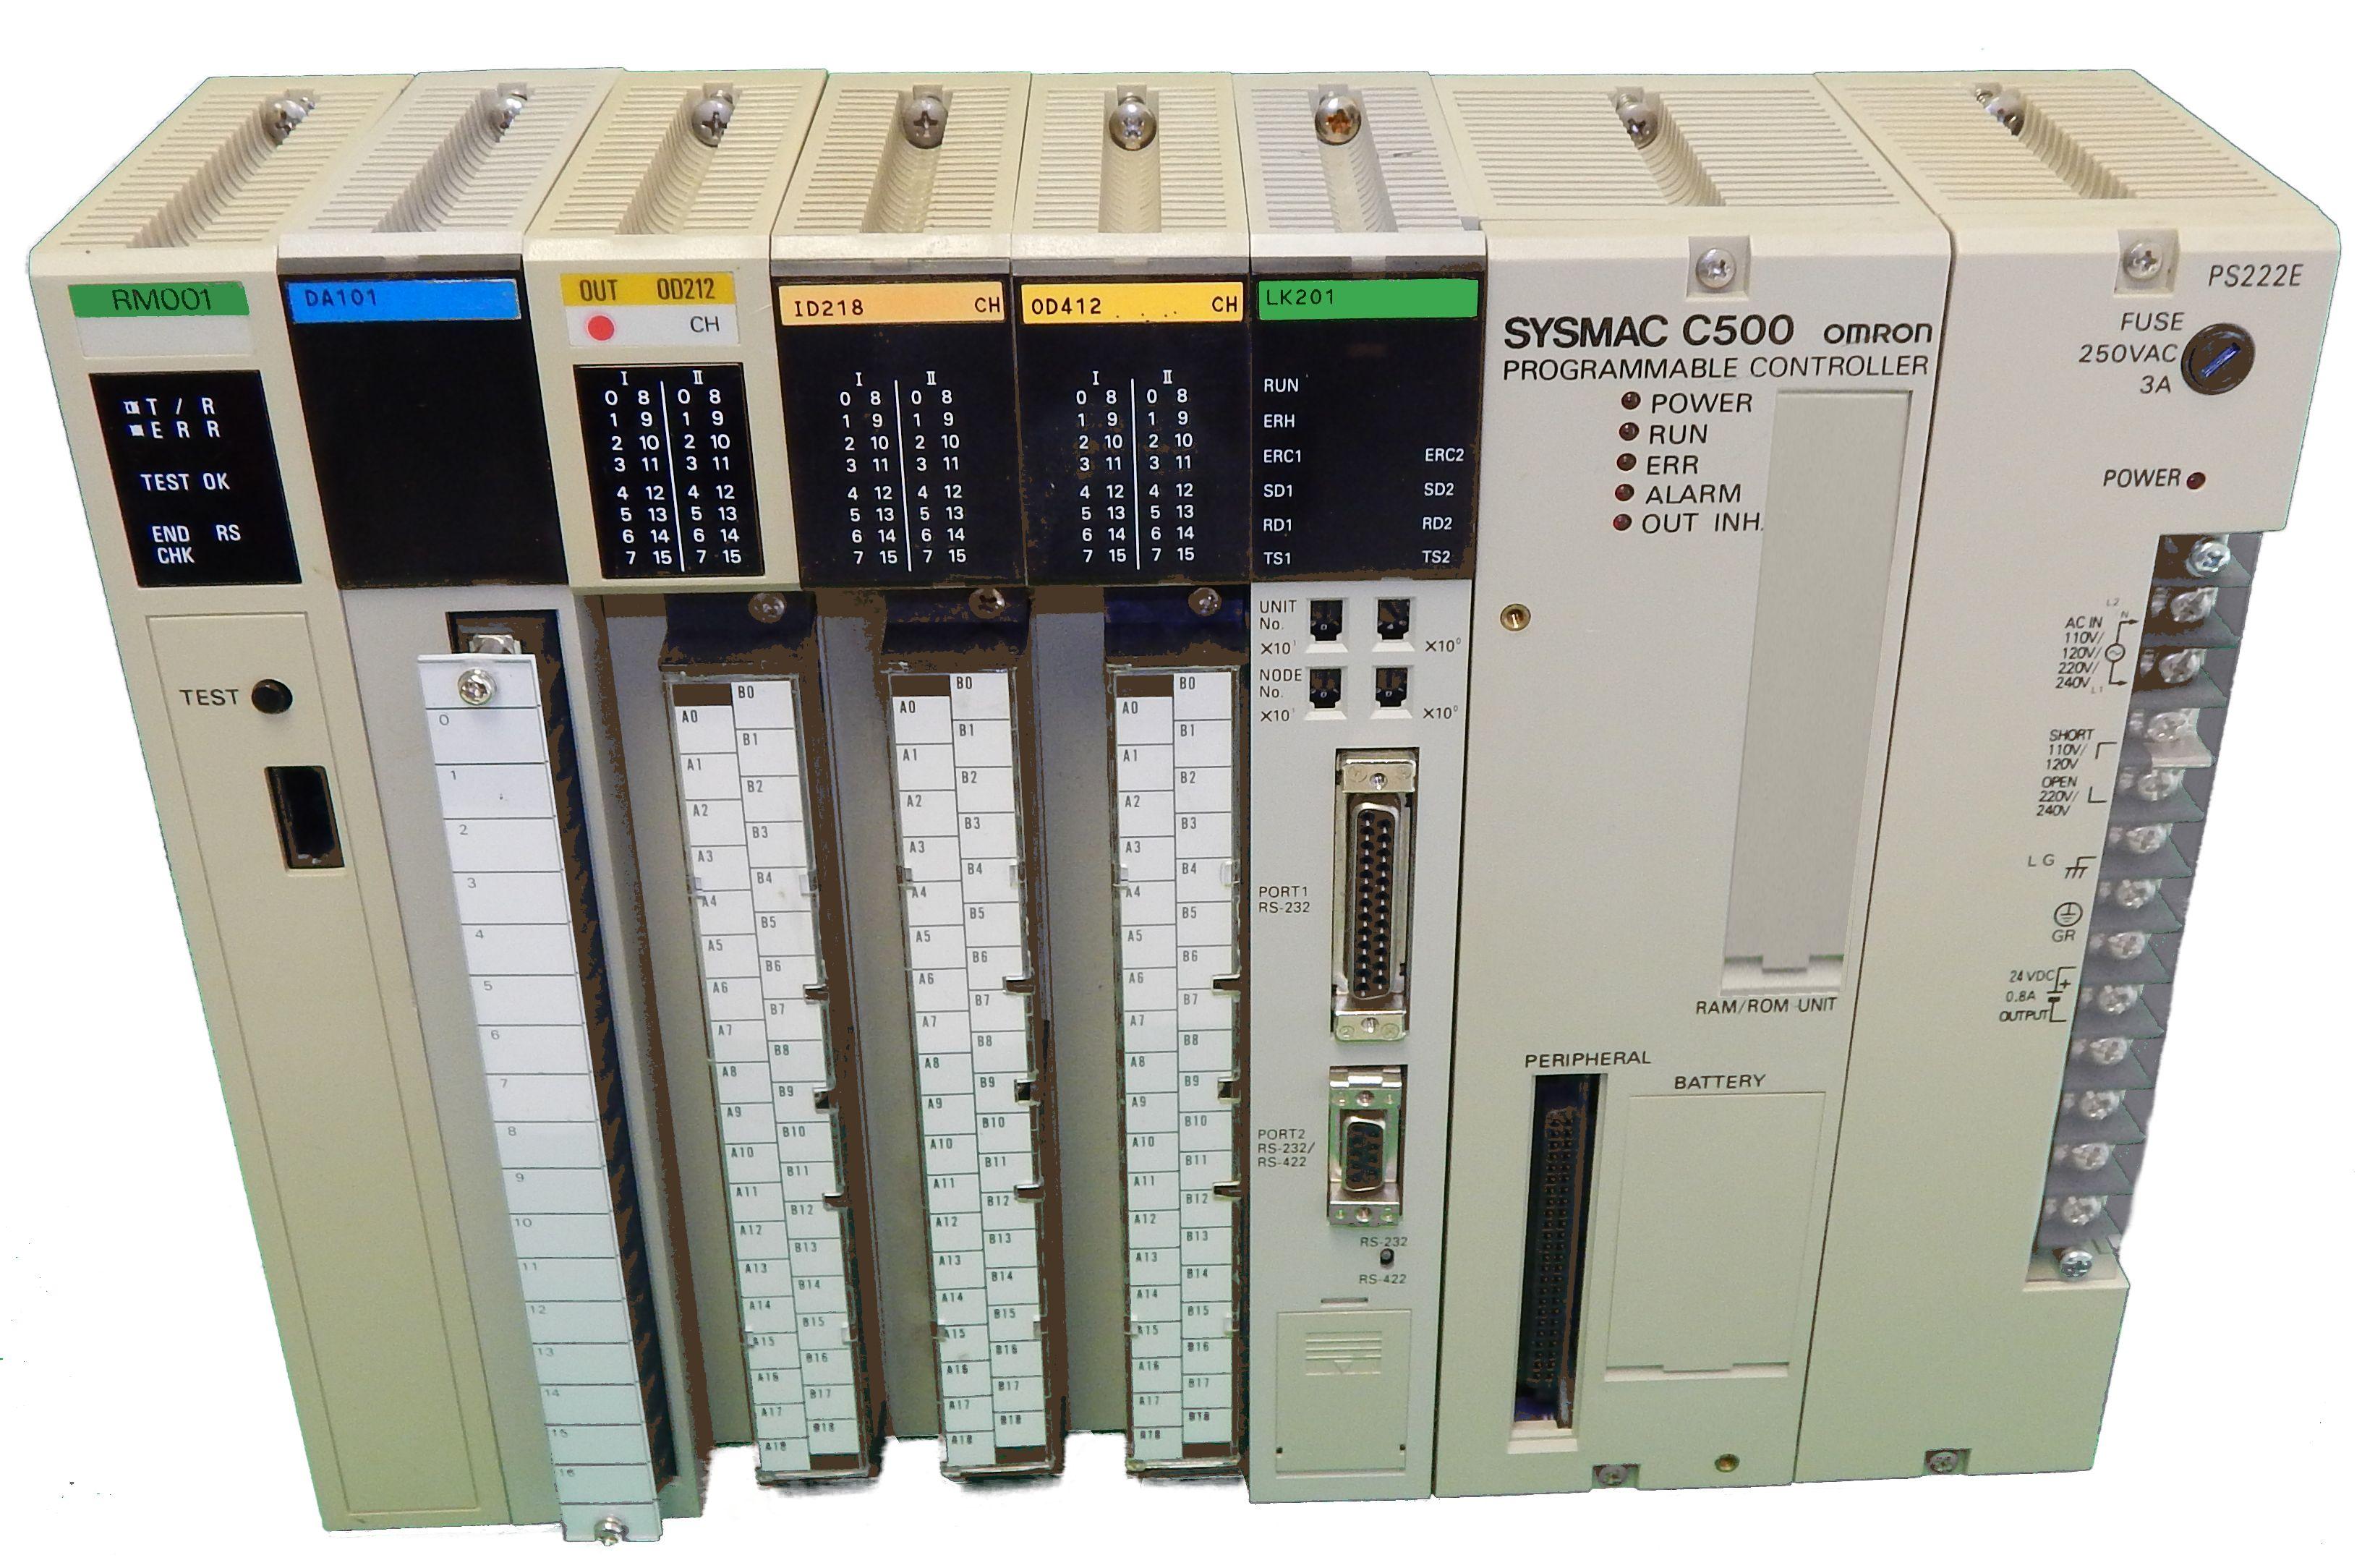 3G2A5-RT002-PEV1